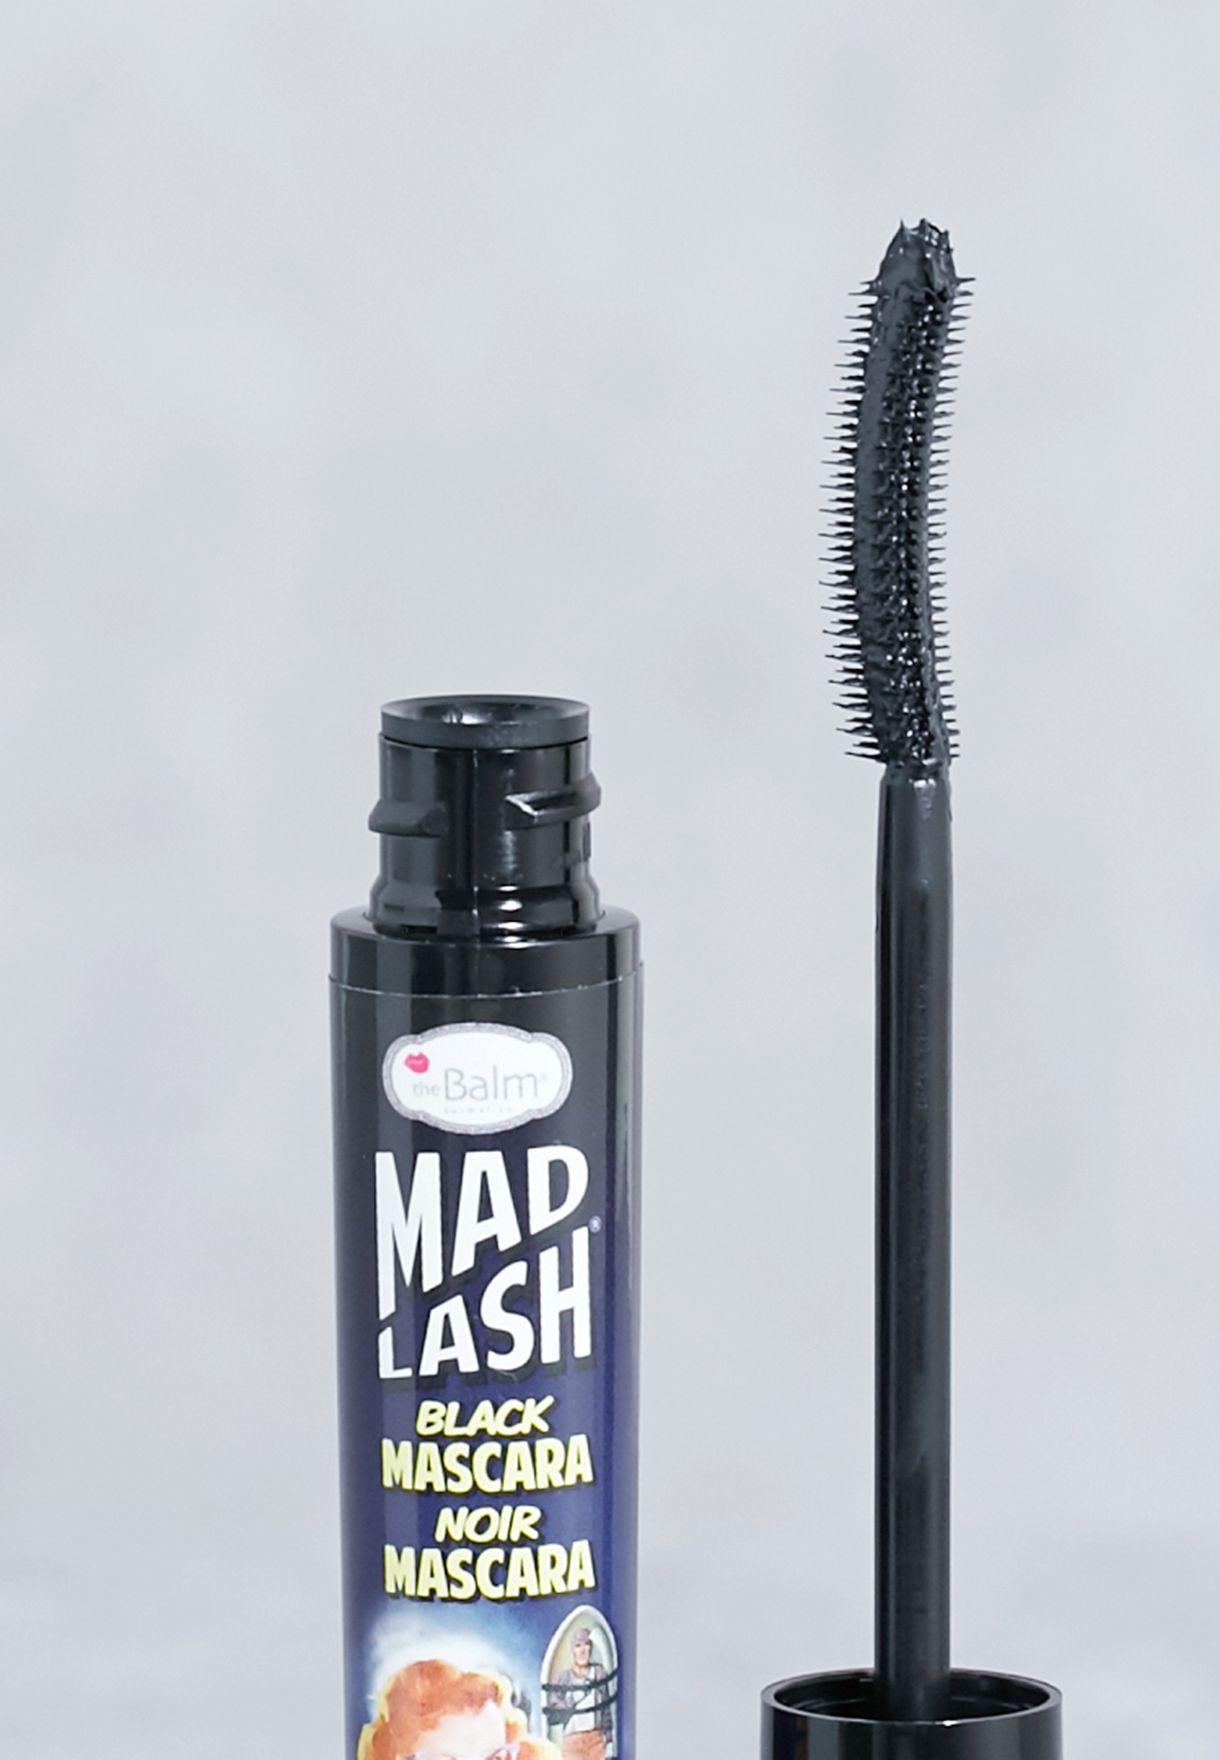 754c0b2e159 Shop The Balm black Mad Lash Mascara 681619806735 for Women in UAE ...